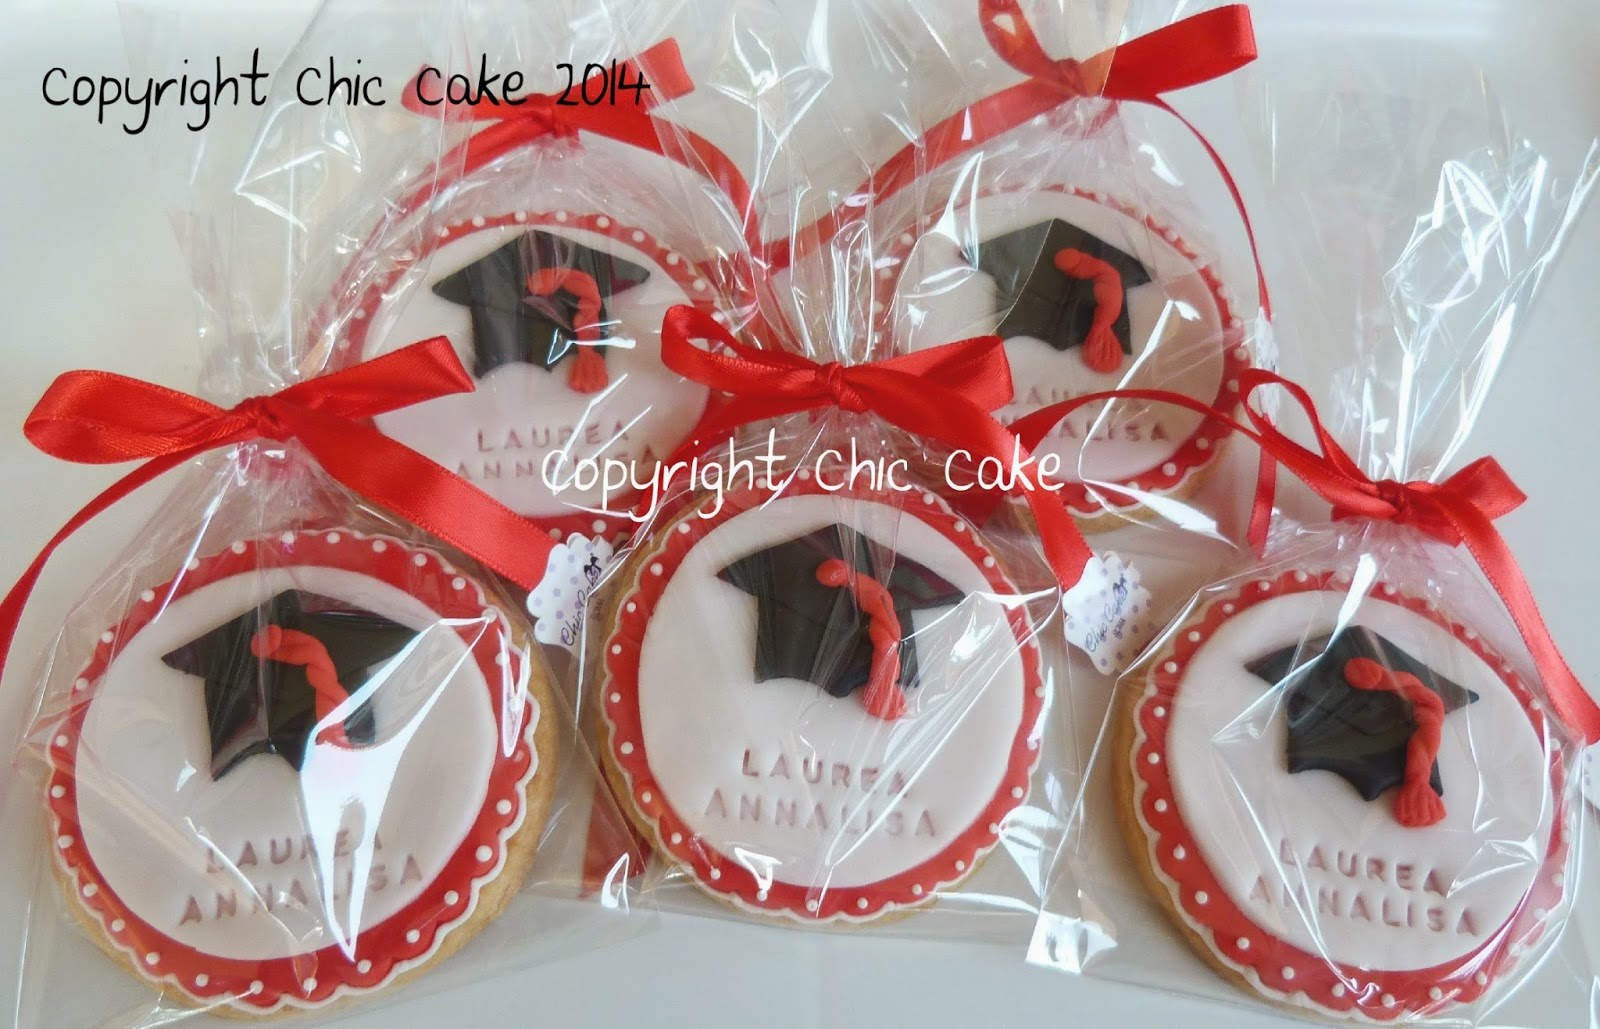 abbastanza Chic Cake: Biscotti Laurea- Graduation cookies BF13